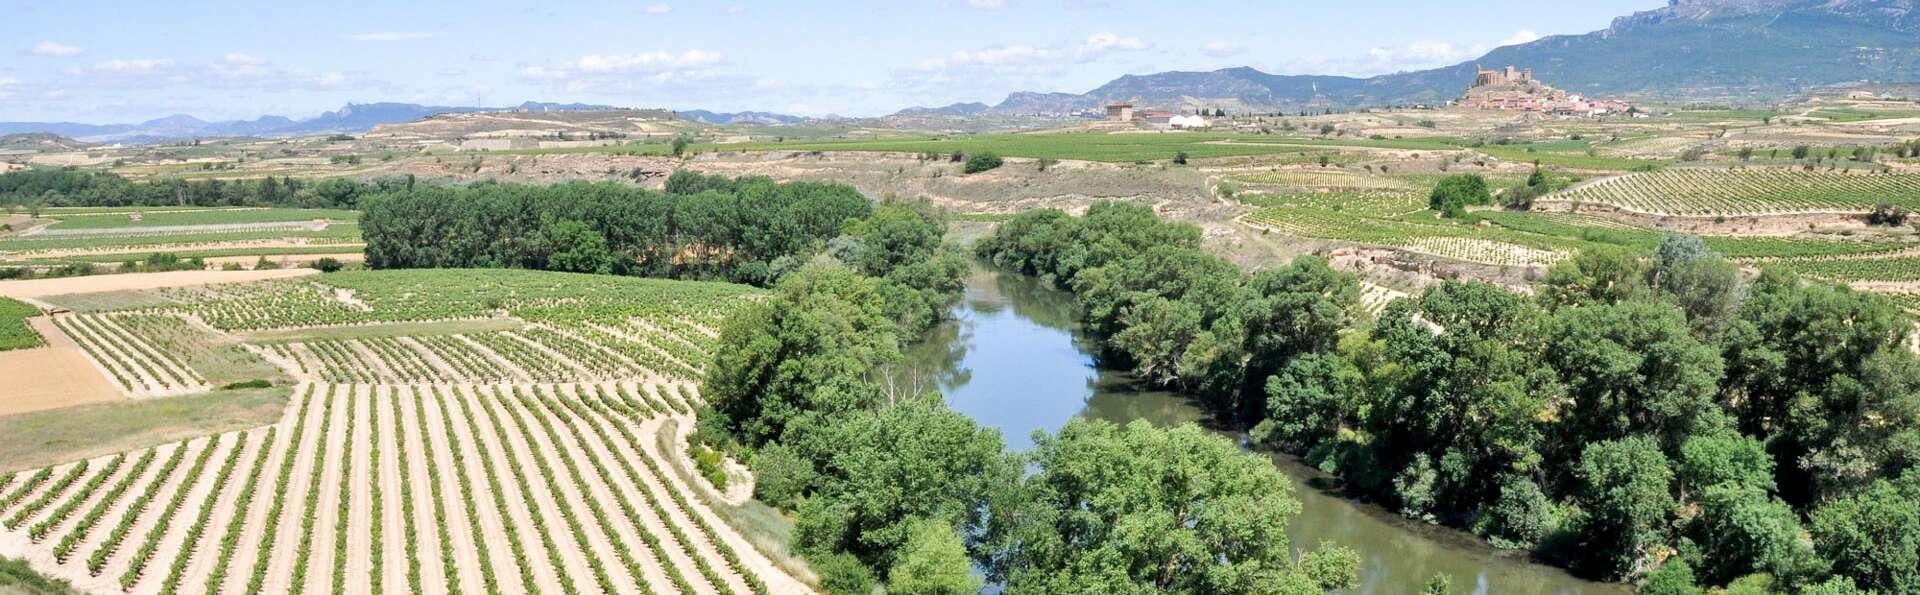 Elegancia Ecológica en Palacio: cena degustación, paseo por viñedos y cata de vino Rioja